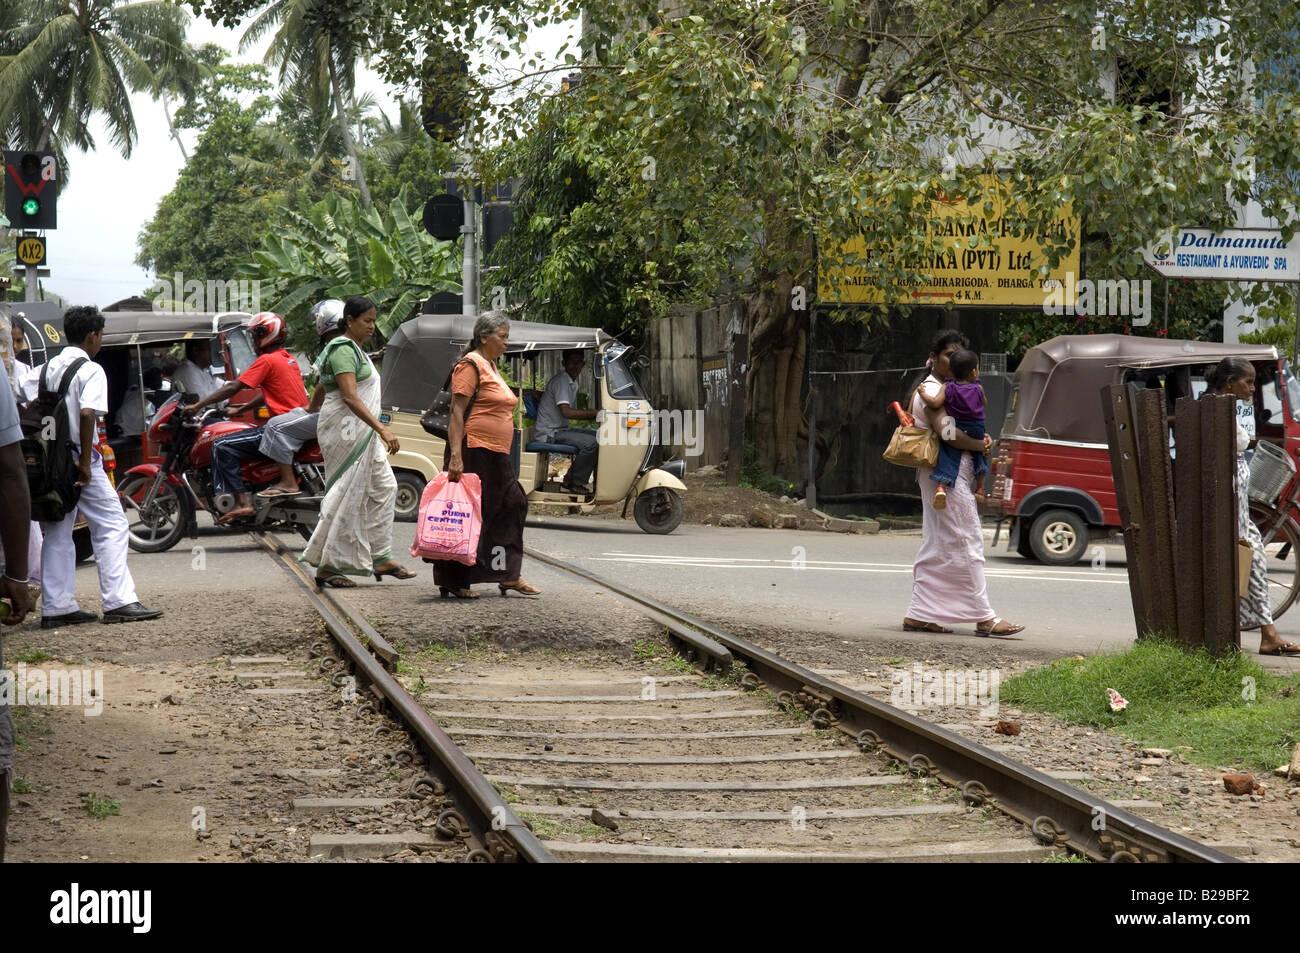 Aluthgama Sri Lanka Date 20 04 2008 Ref ZB648 115261 0010 COMPULSORY CREDIT World Pictures Photoshot - Stock Image